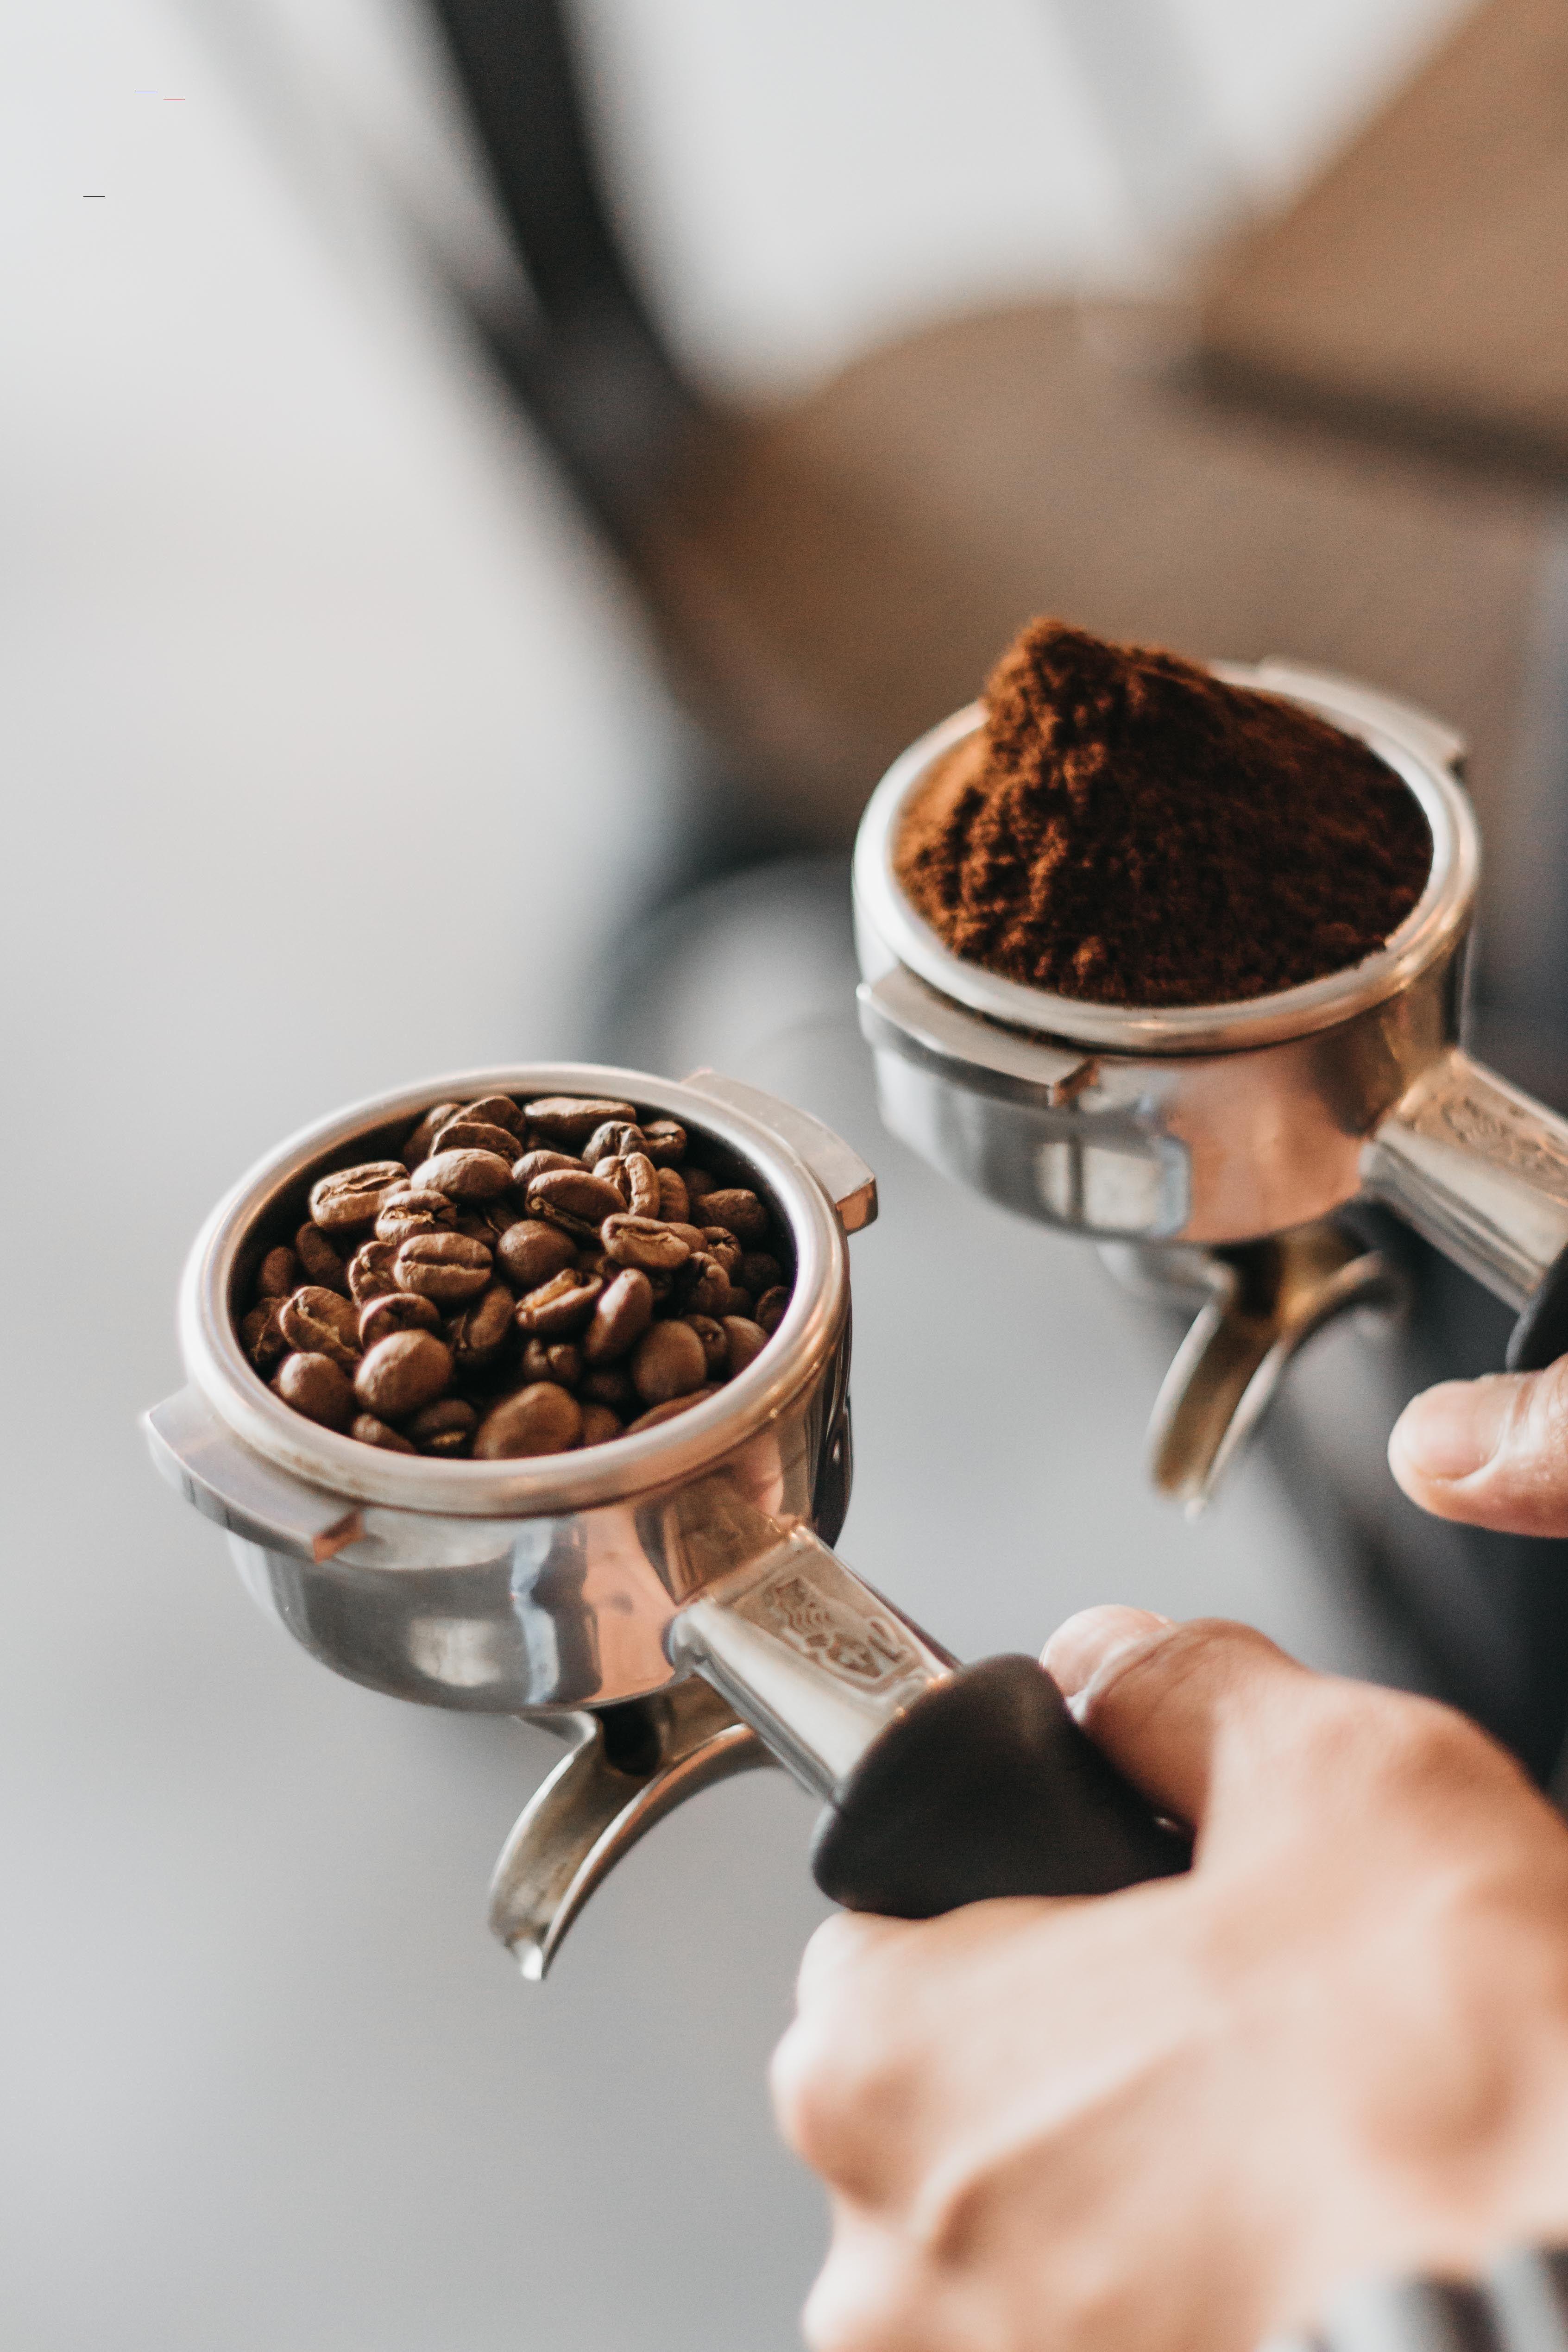 Best Coffee 7 Espresso Tips To Follow